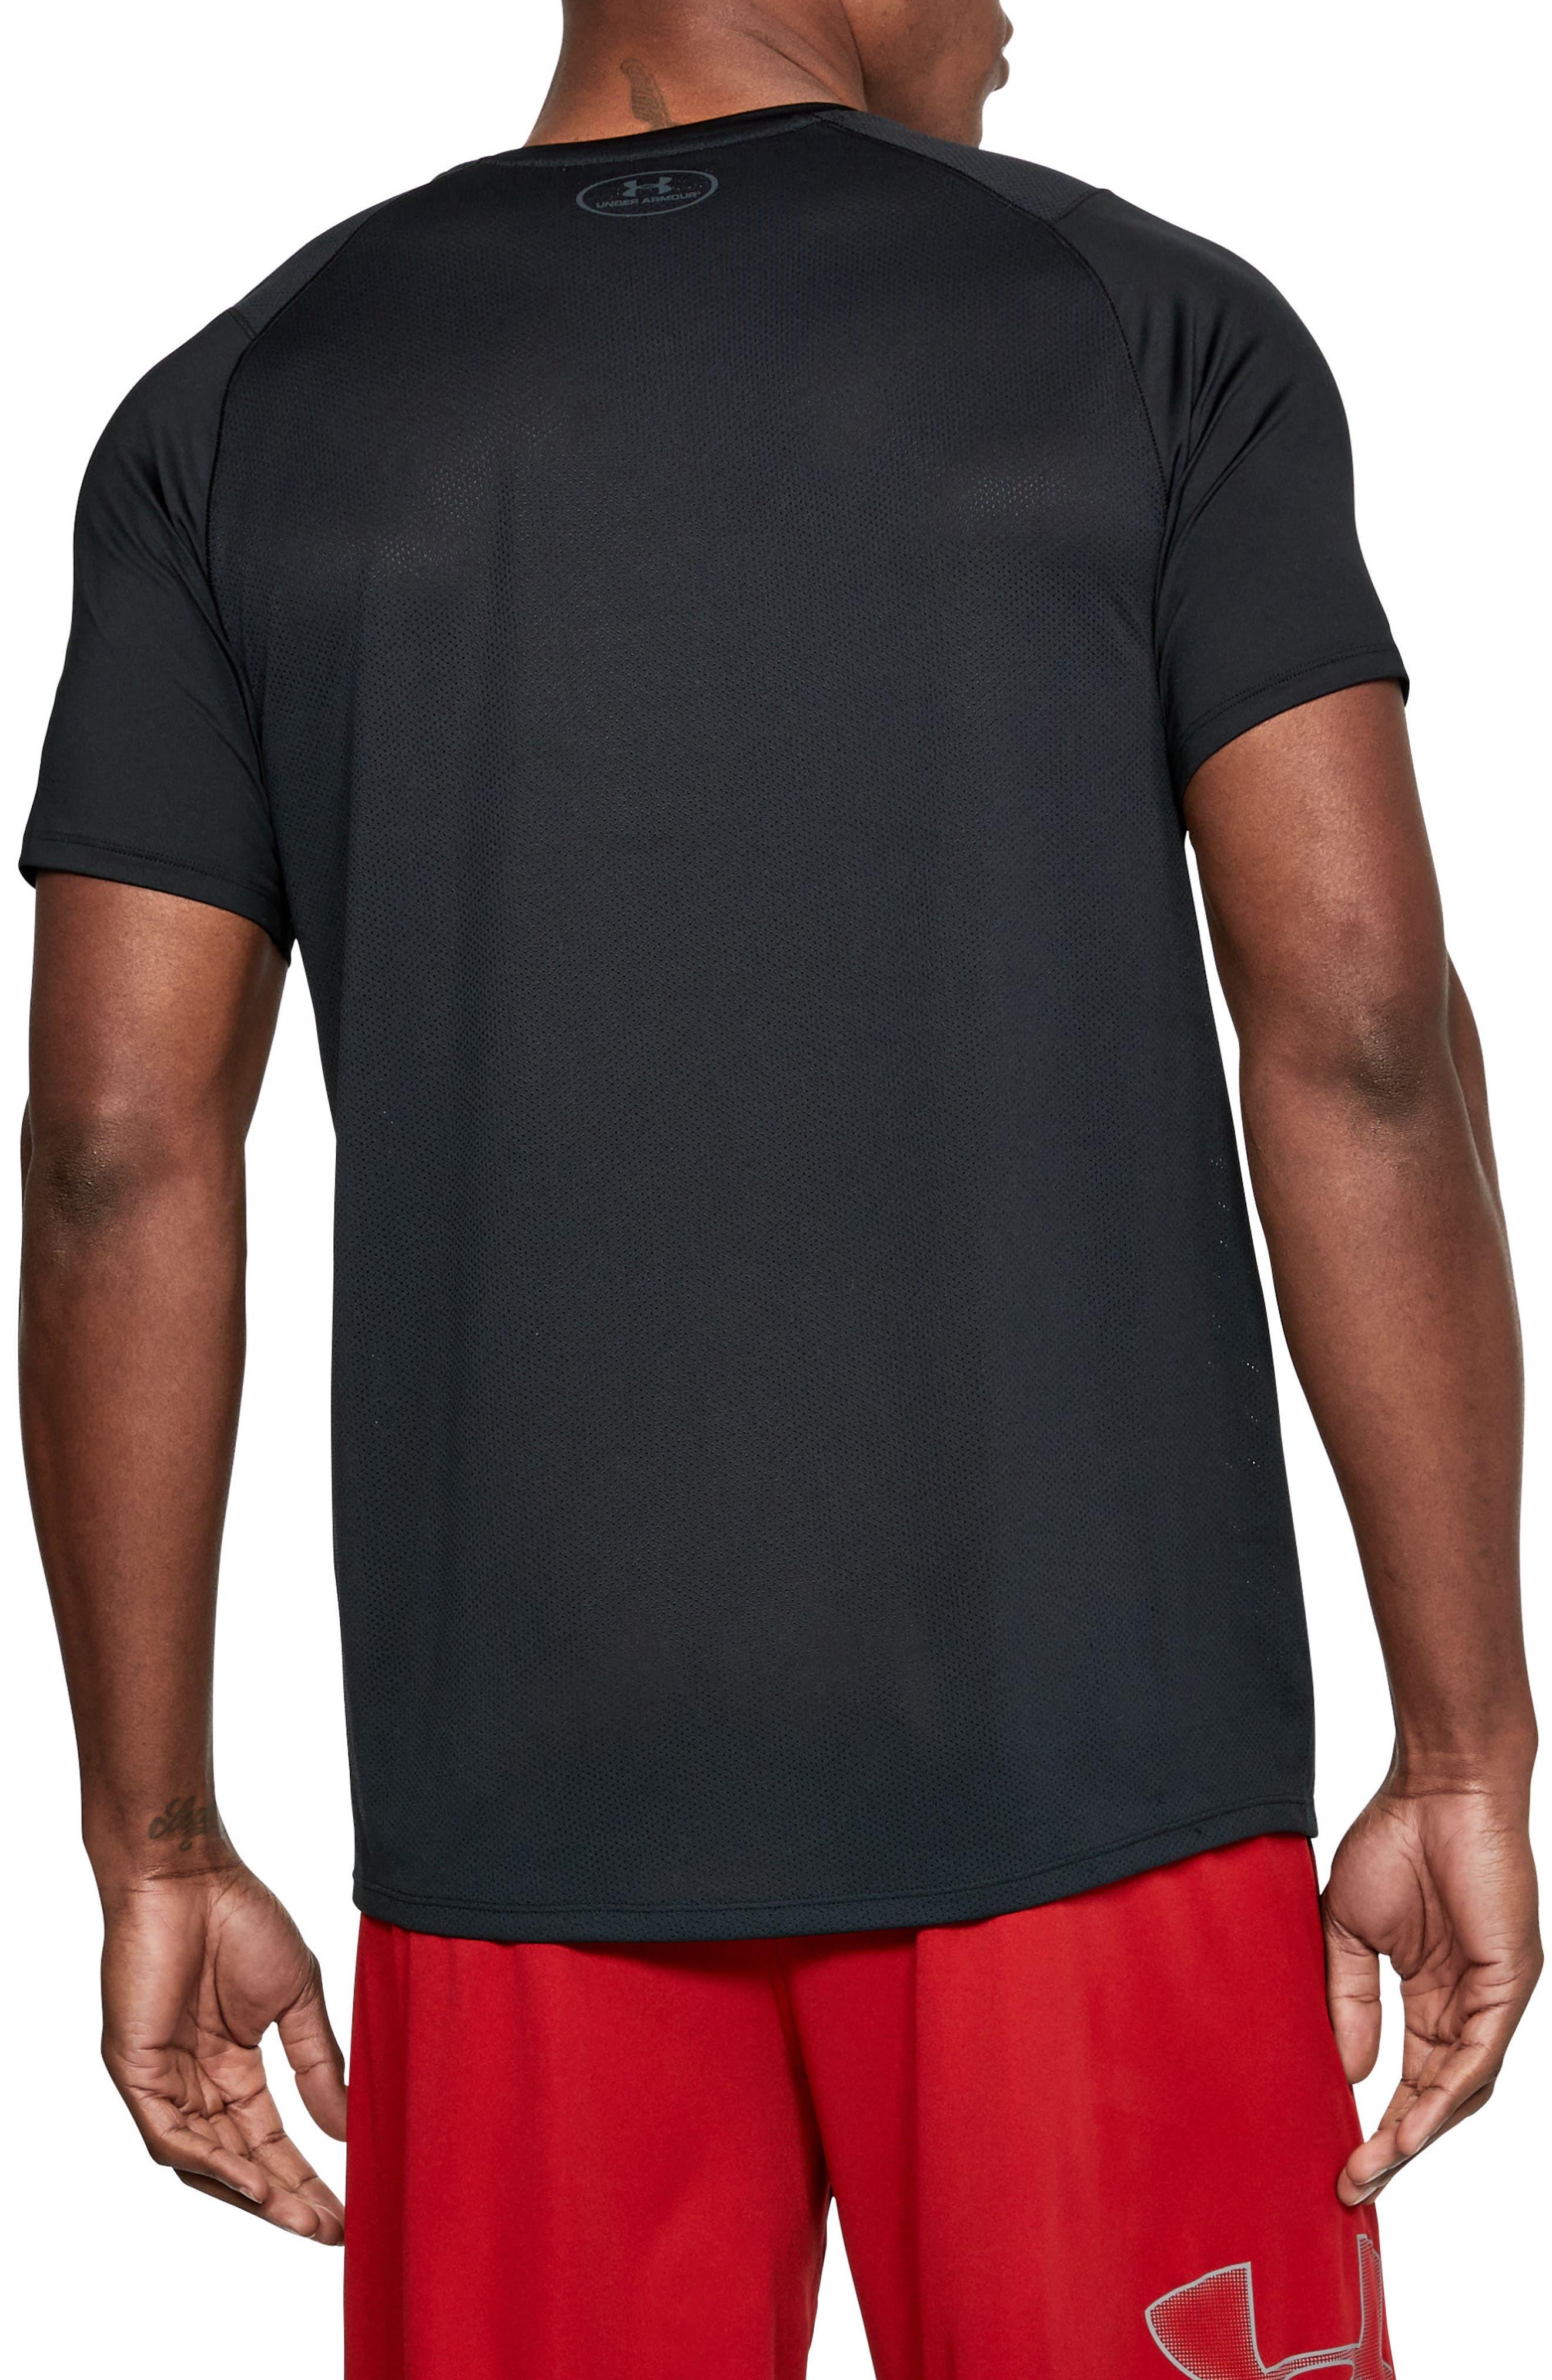 Raid 2.0 Crewneck T-Shirt,                             Alternate thumbnail 2, color,                             Black/ Stealth Gray